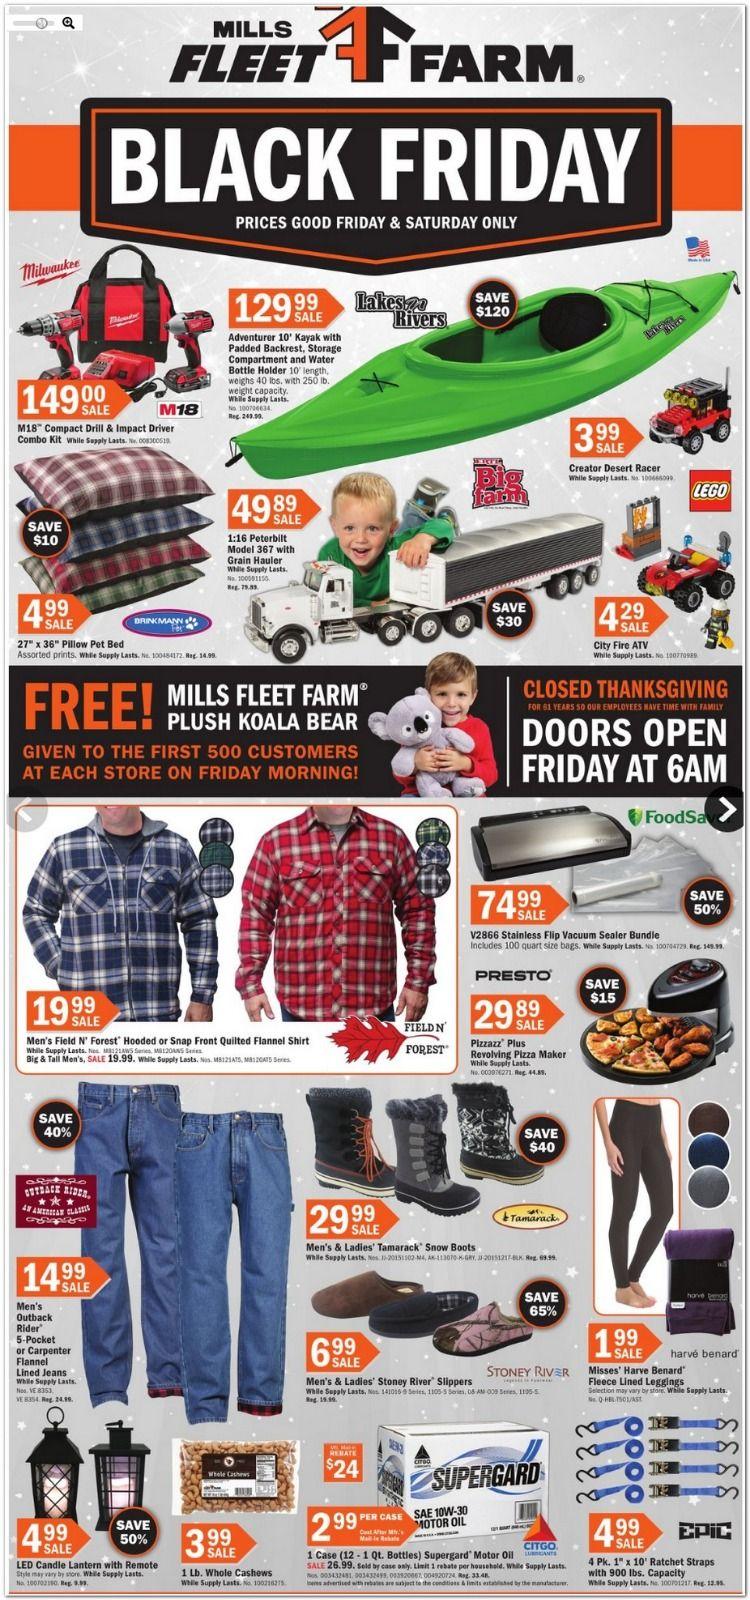 Mills Fleet Farm Black Friday 2020 Deals Get Exciting Deals On Clothing Fleet Farm Black Friday Black Friday Prices